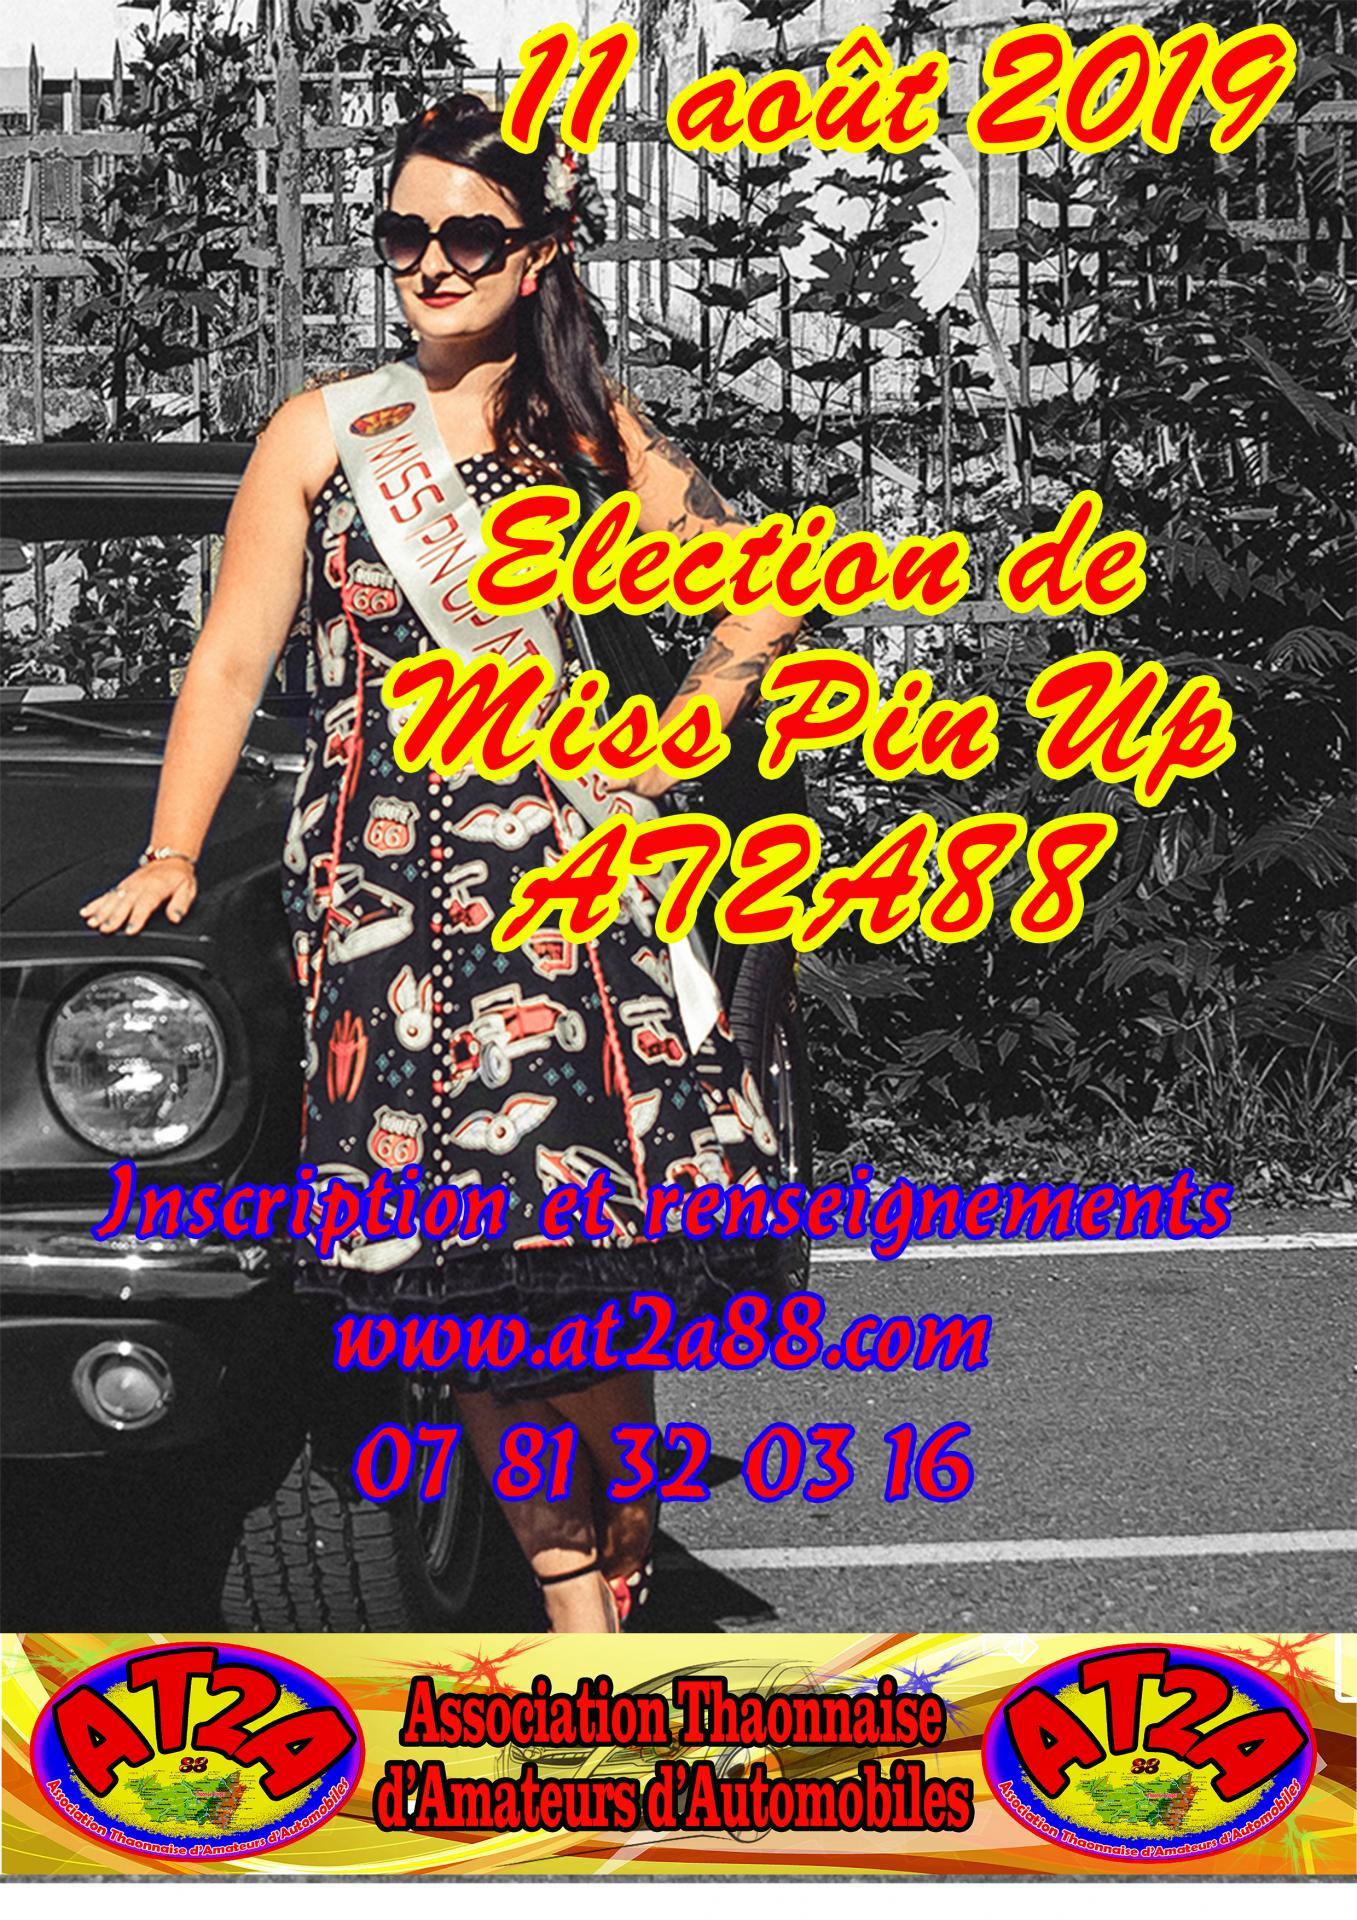 85910bb0305c Election de Miss Pin Up 2019